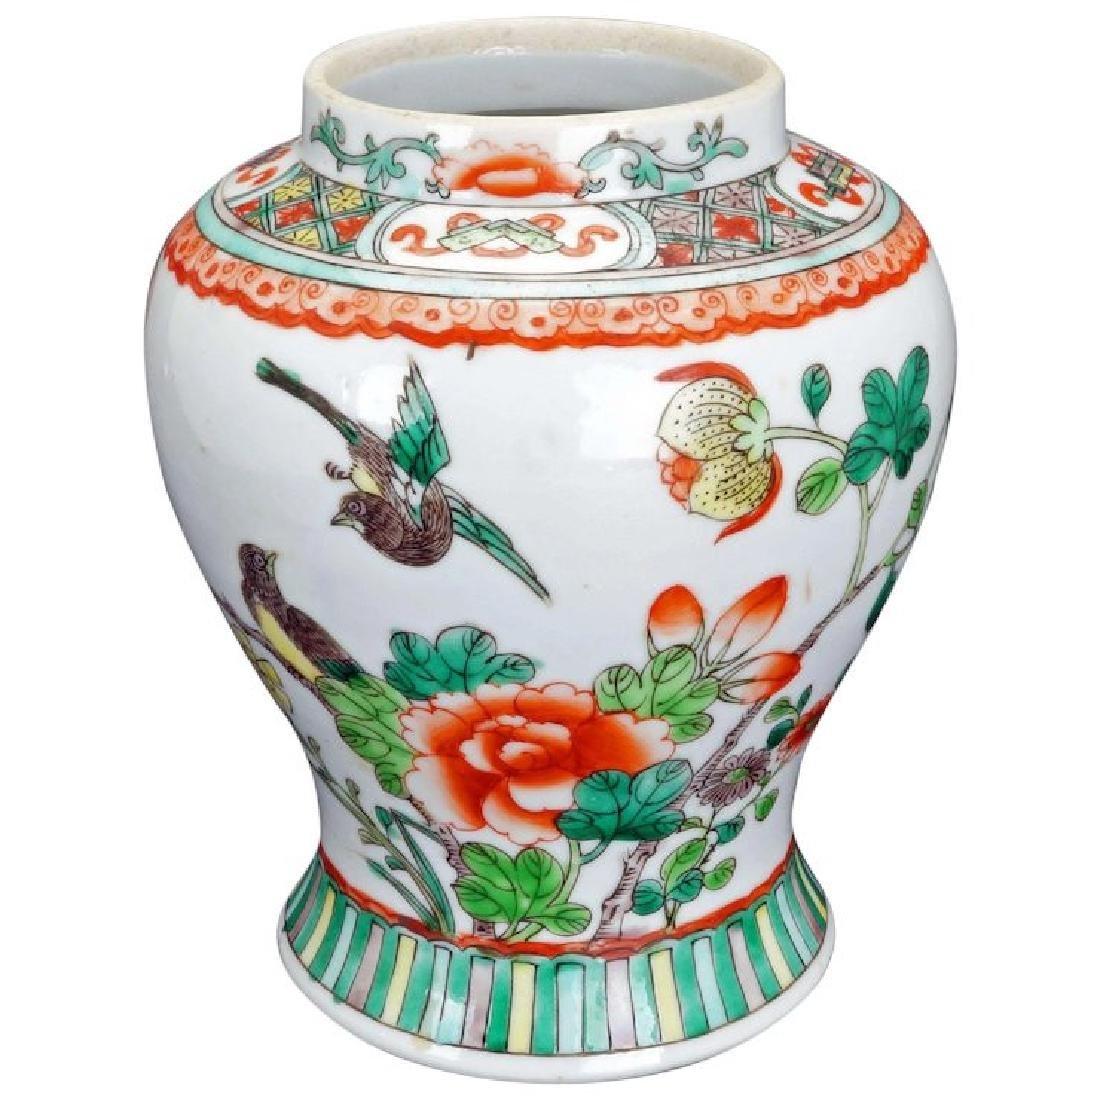 Antique Chinese porcelain over glaze enamel vase circa